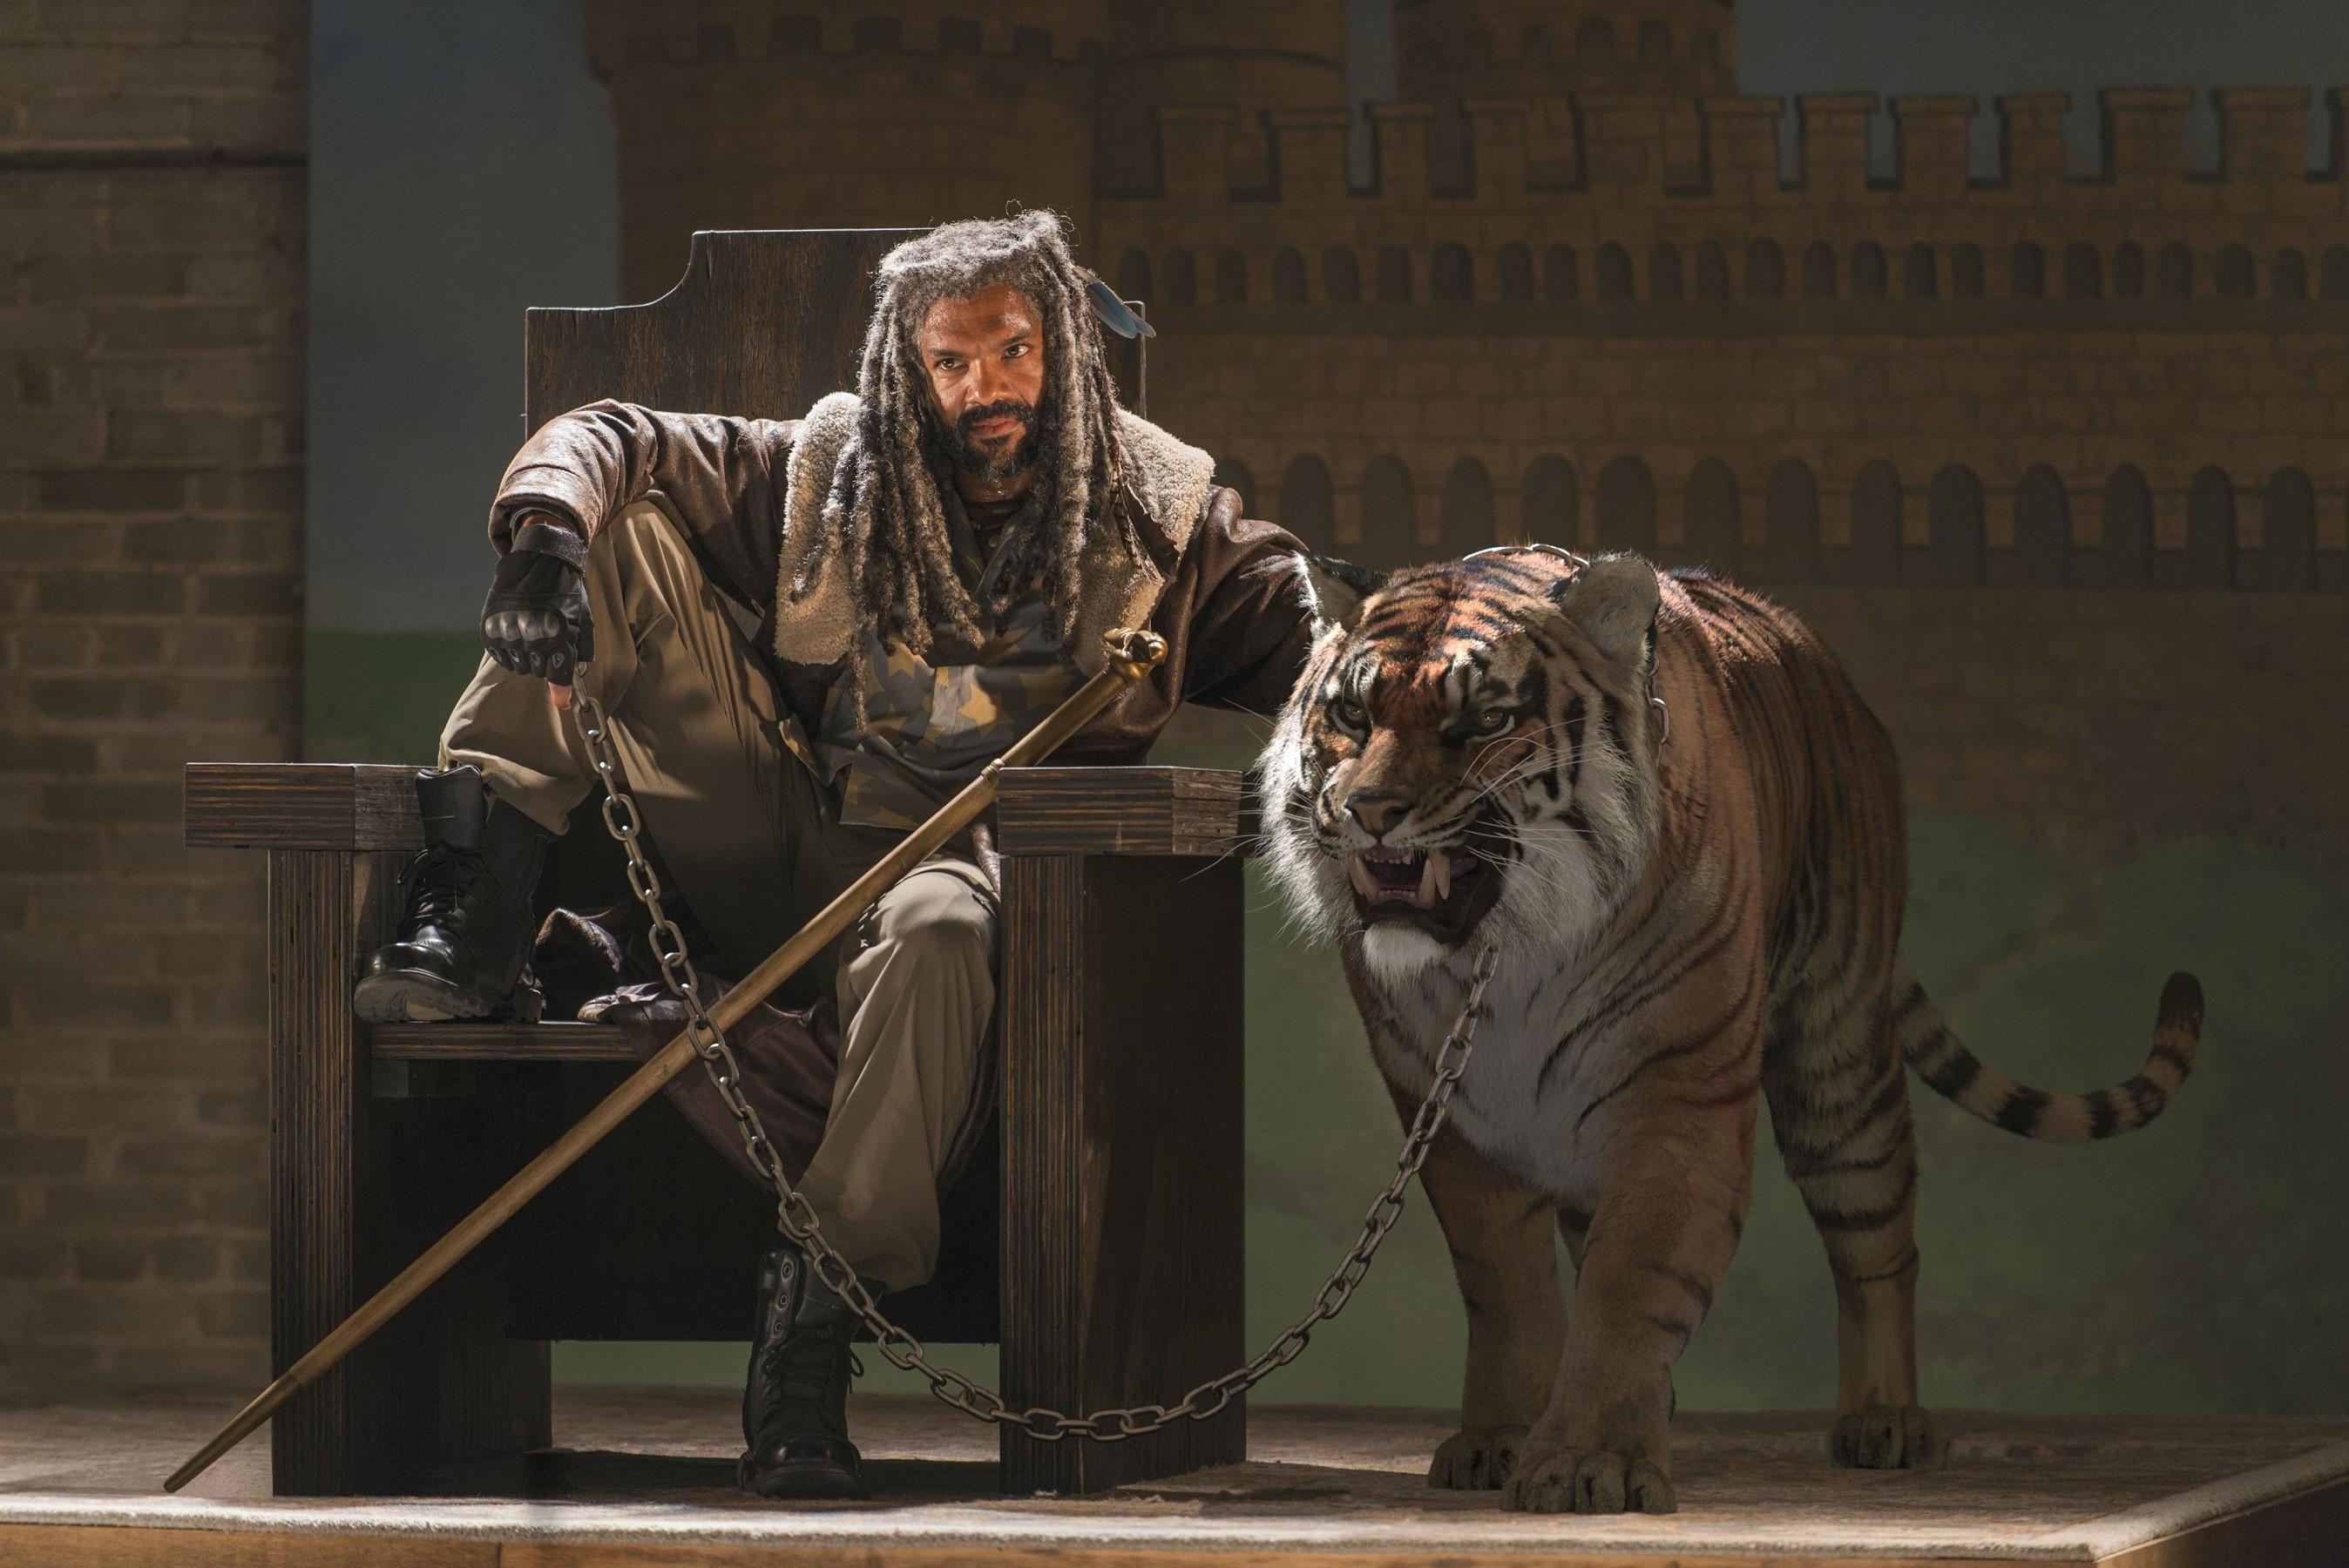 TV Series / Ezekiel Wallpaper. Ezekiel, Khary Payton, The Walking Dead,  Season 7